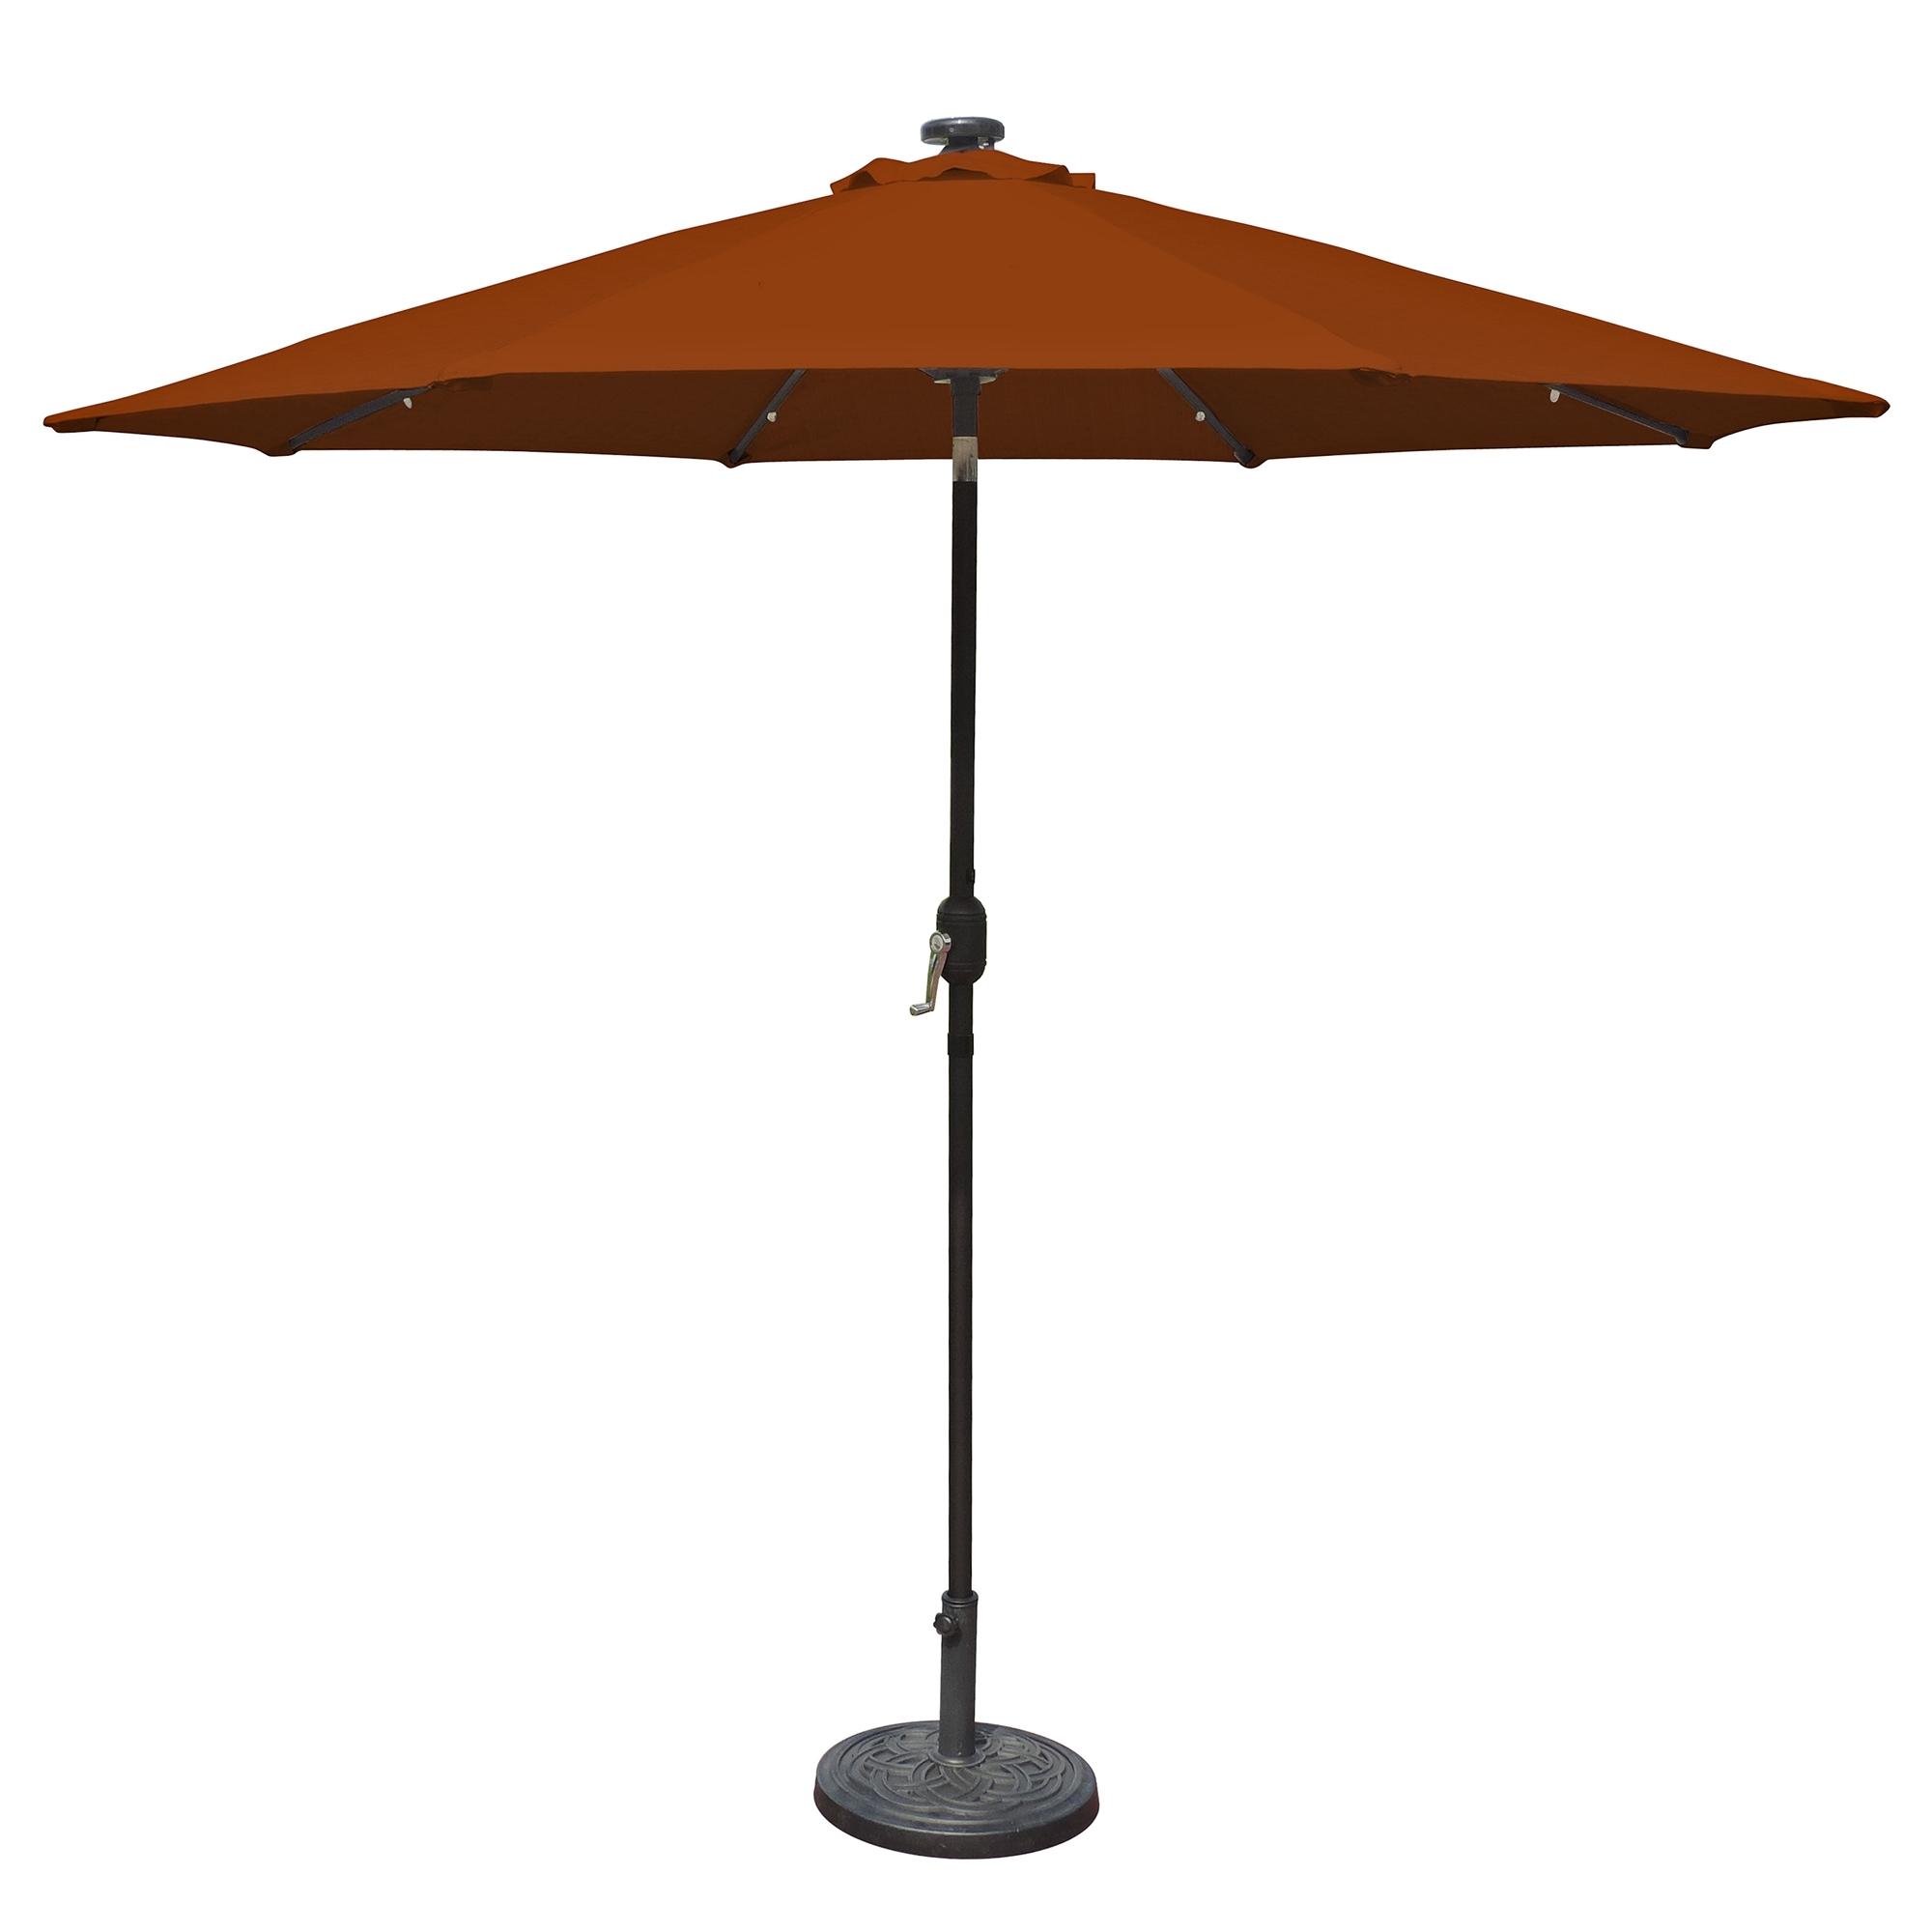 Island Umbrella Mirage Fiesta 9 Ft Market Solar Led Auto Tilt Patio Inside Preferred Led Patio Umbrellas (View 9 of 20)